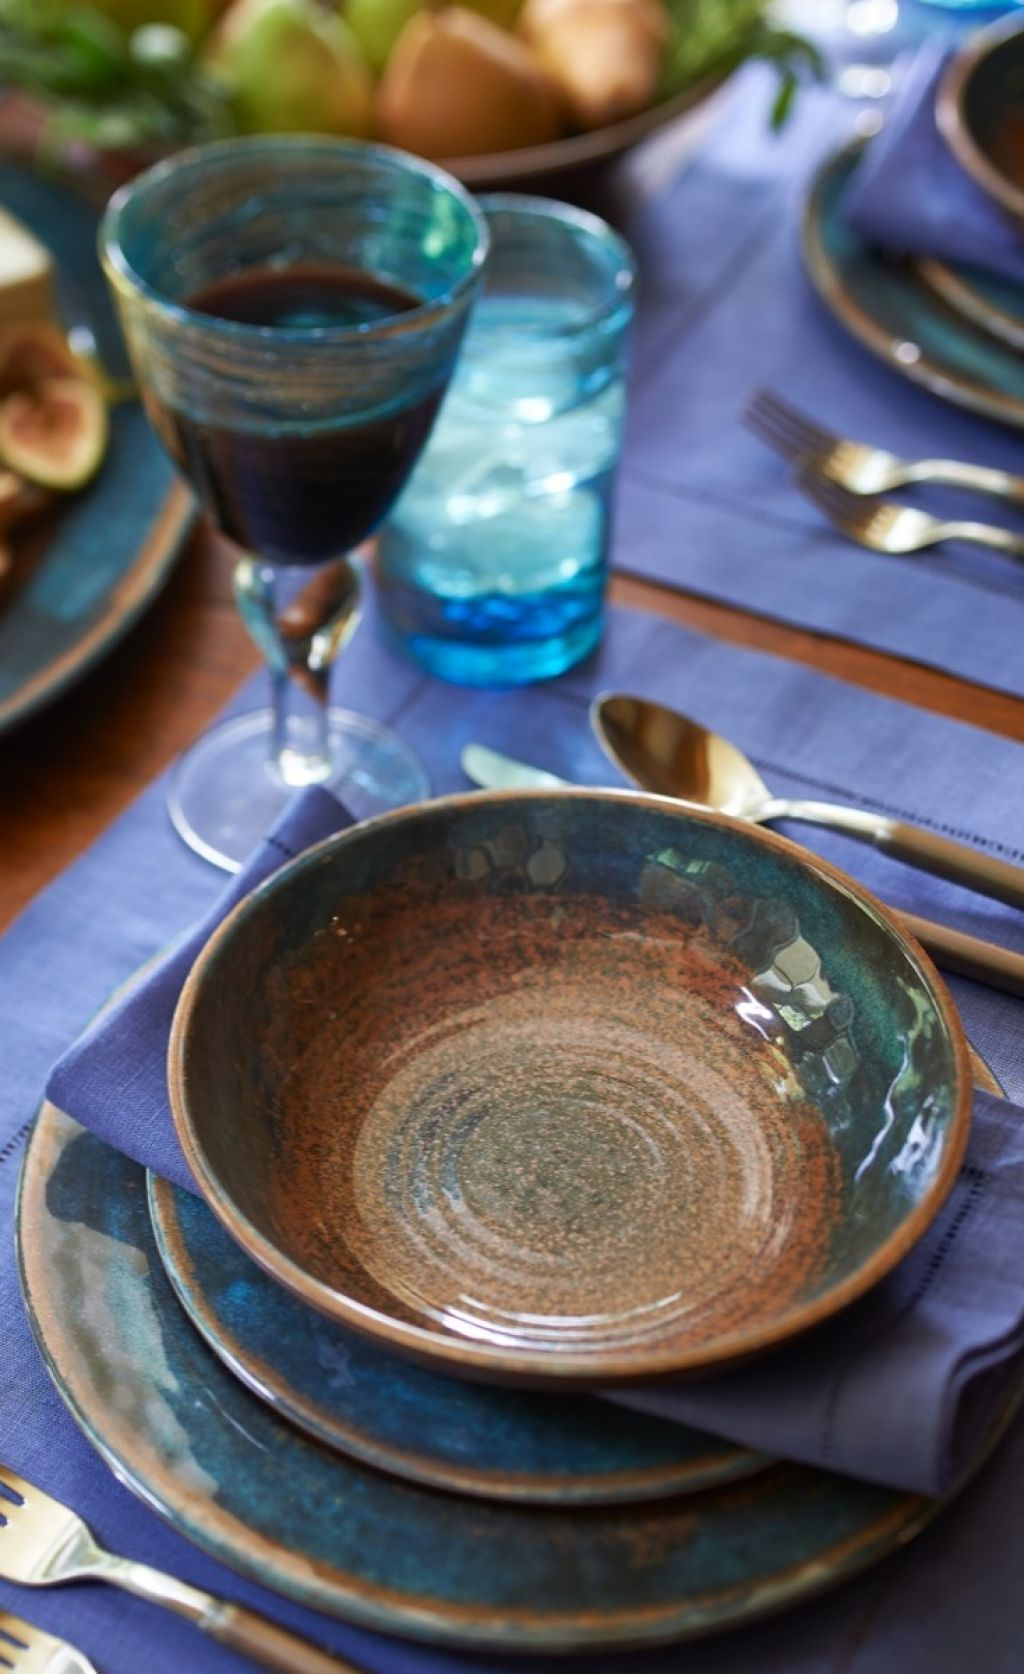 Silk Modern Dinnerware Set In 2019 Ideas For The House